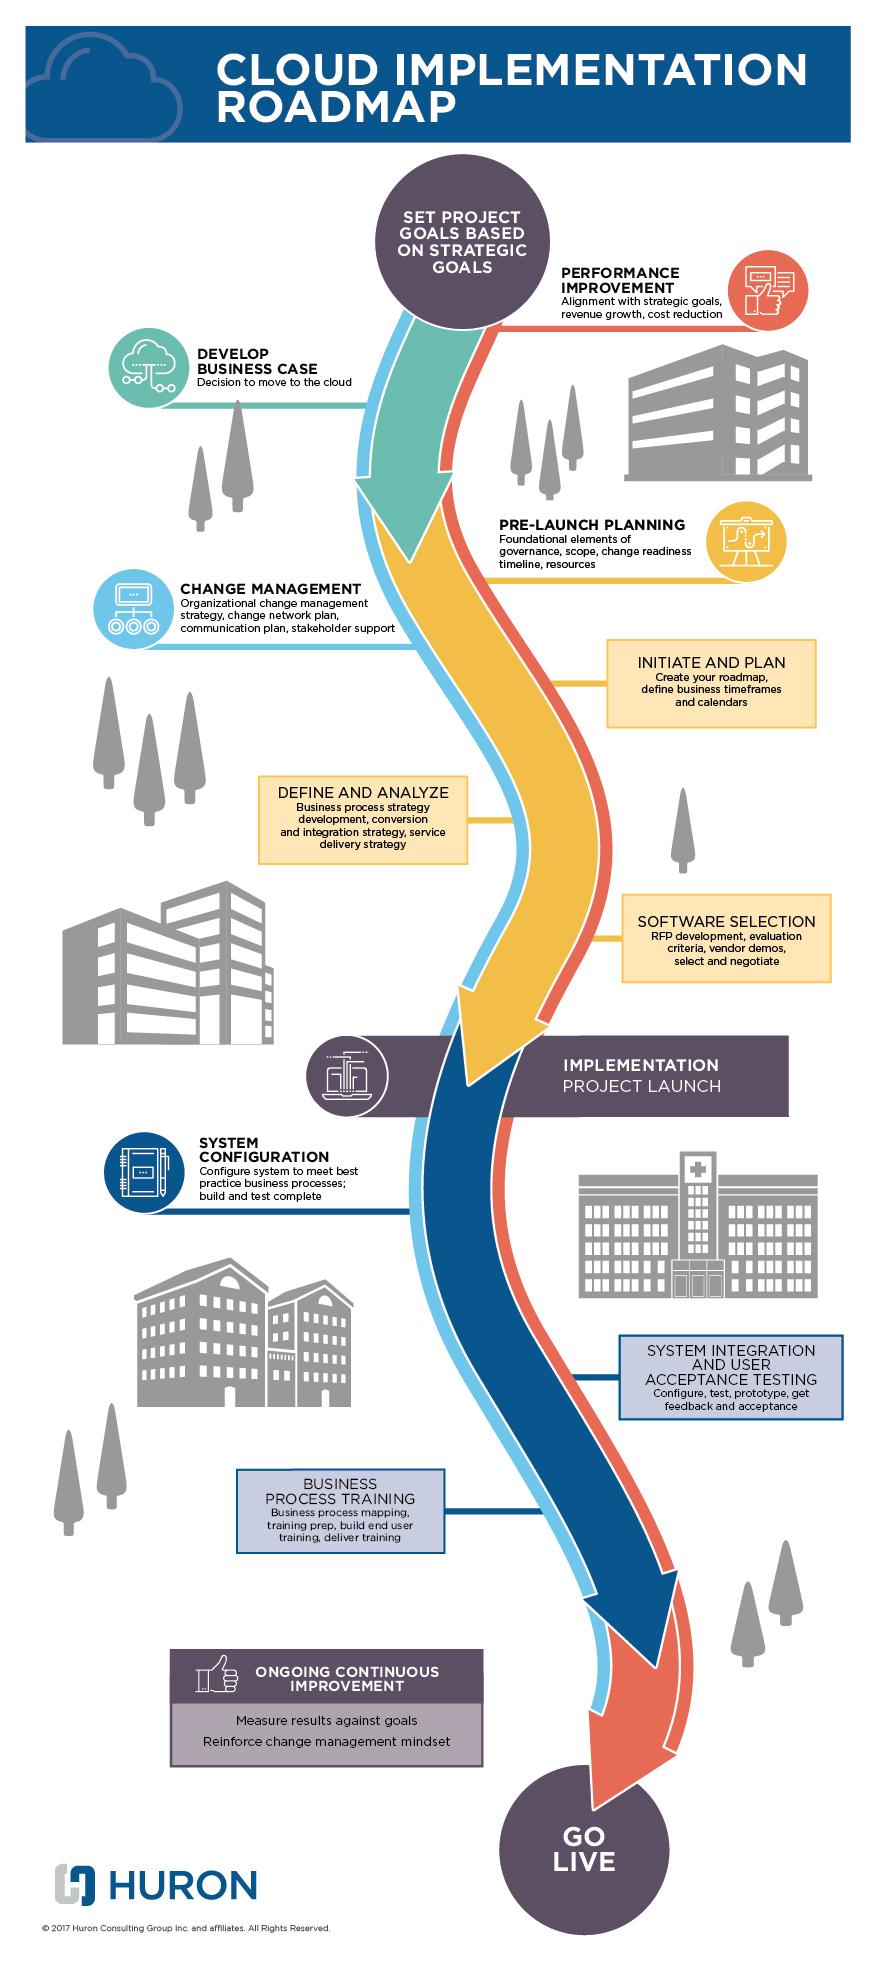 a cloud implementation roadmap for healthcare